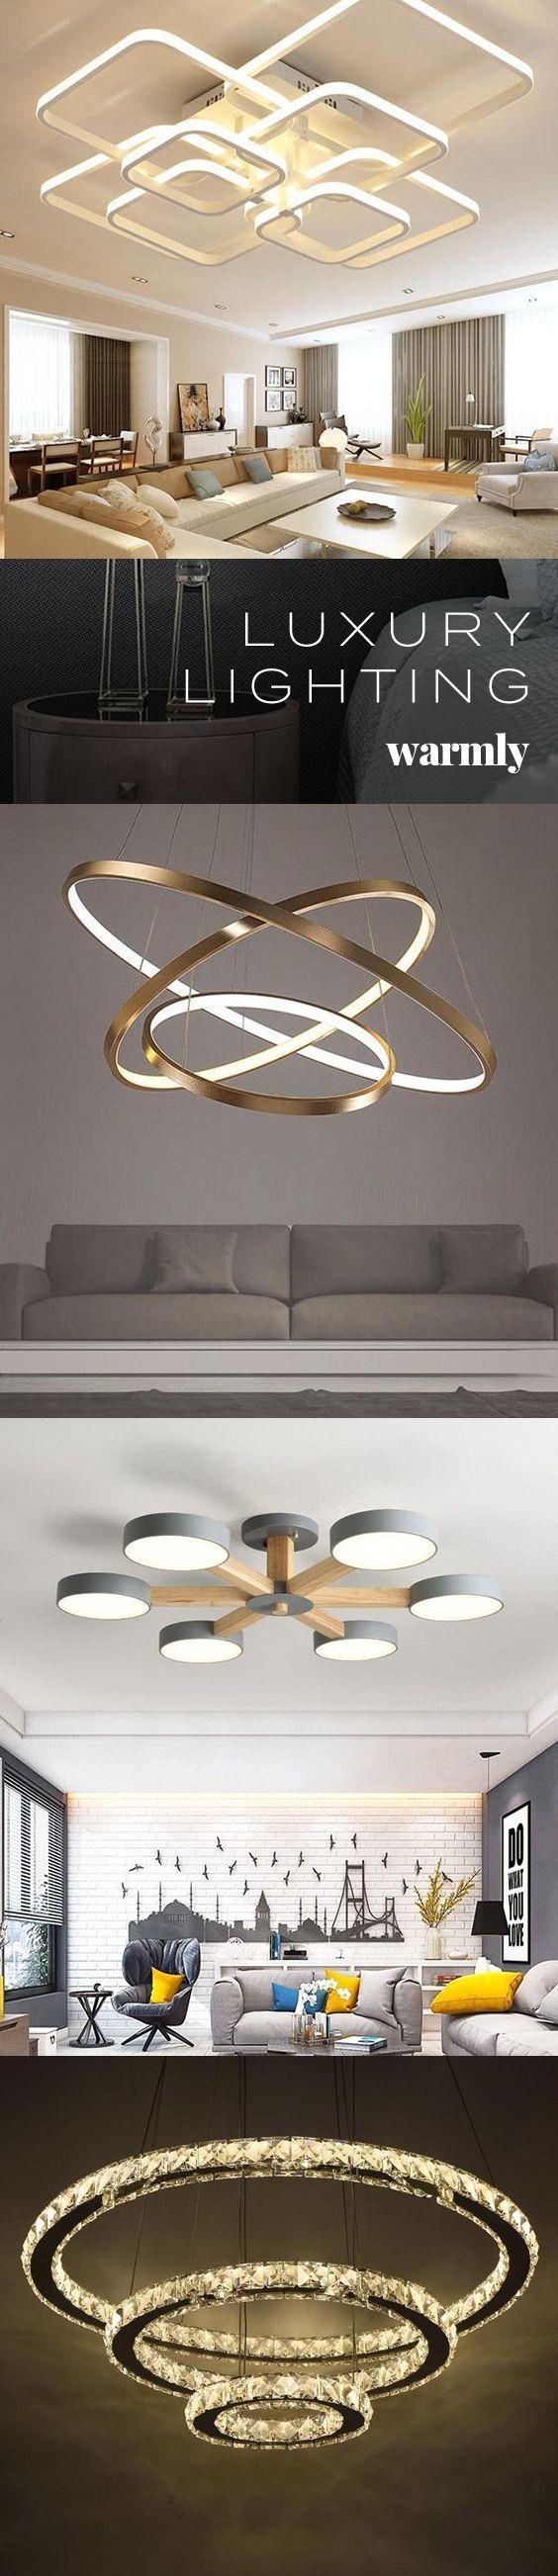 best diy lighting ideas modern luxury